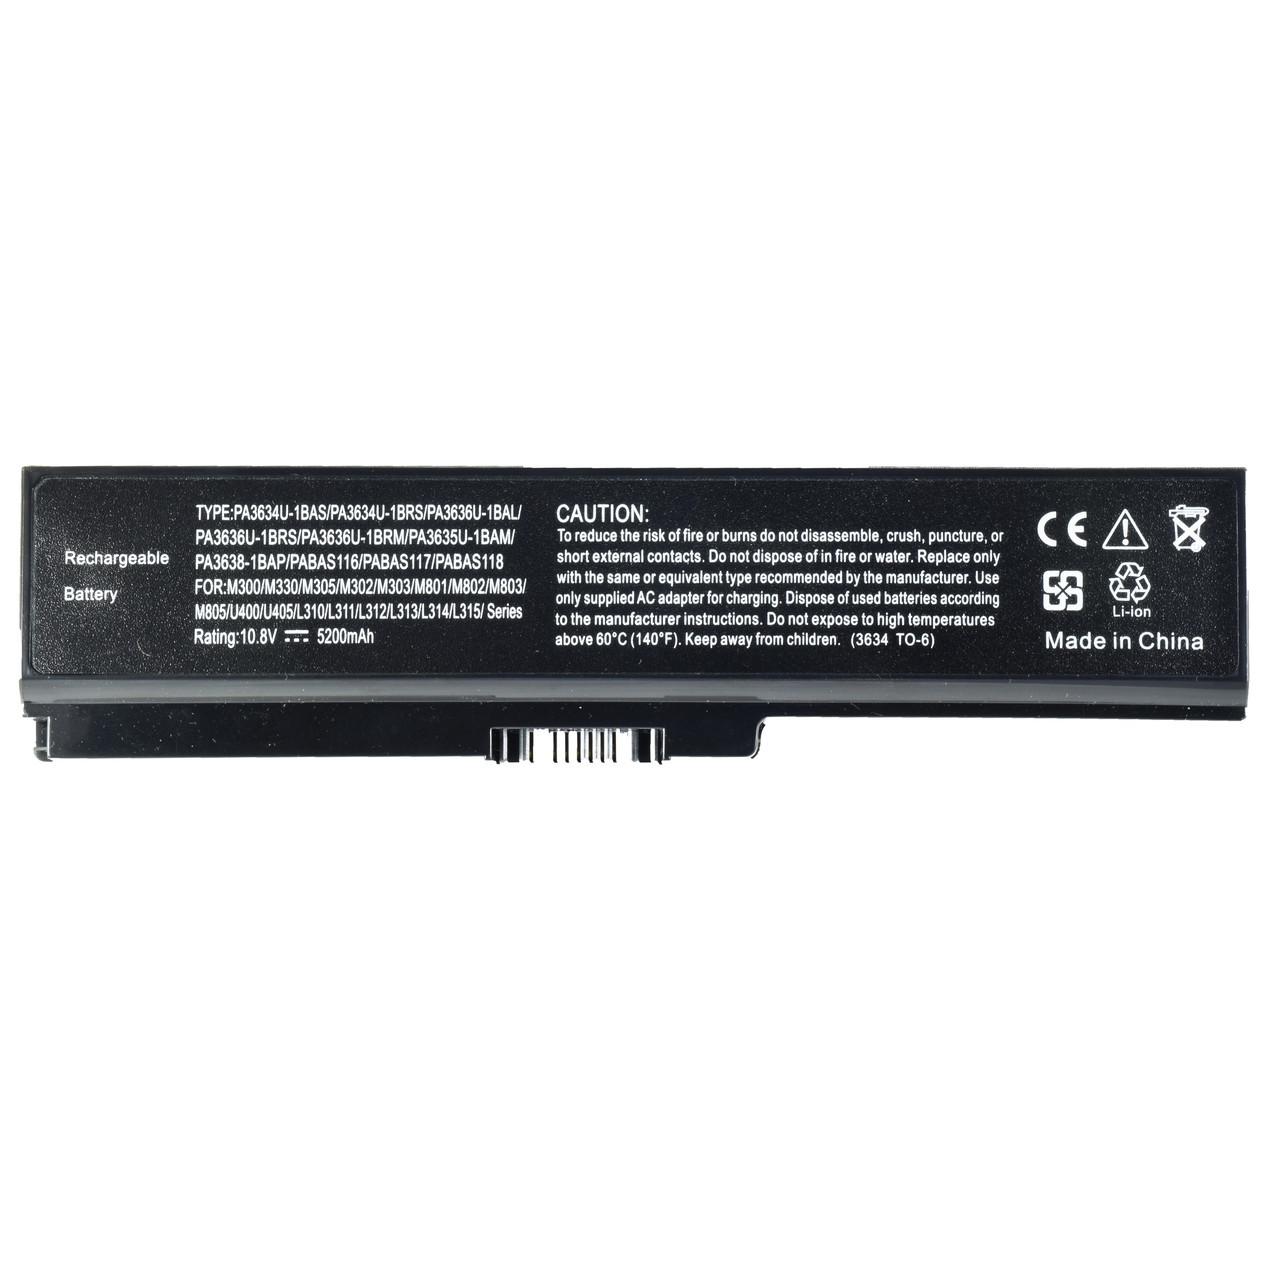 Батарея для ноутбука PABAS215 PABAS227 PABAS228 PABAS229 PABAS230 TS-M305